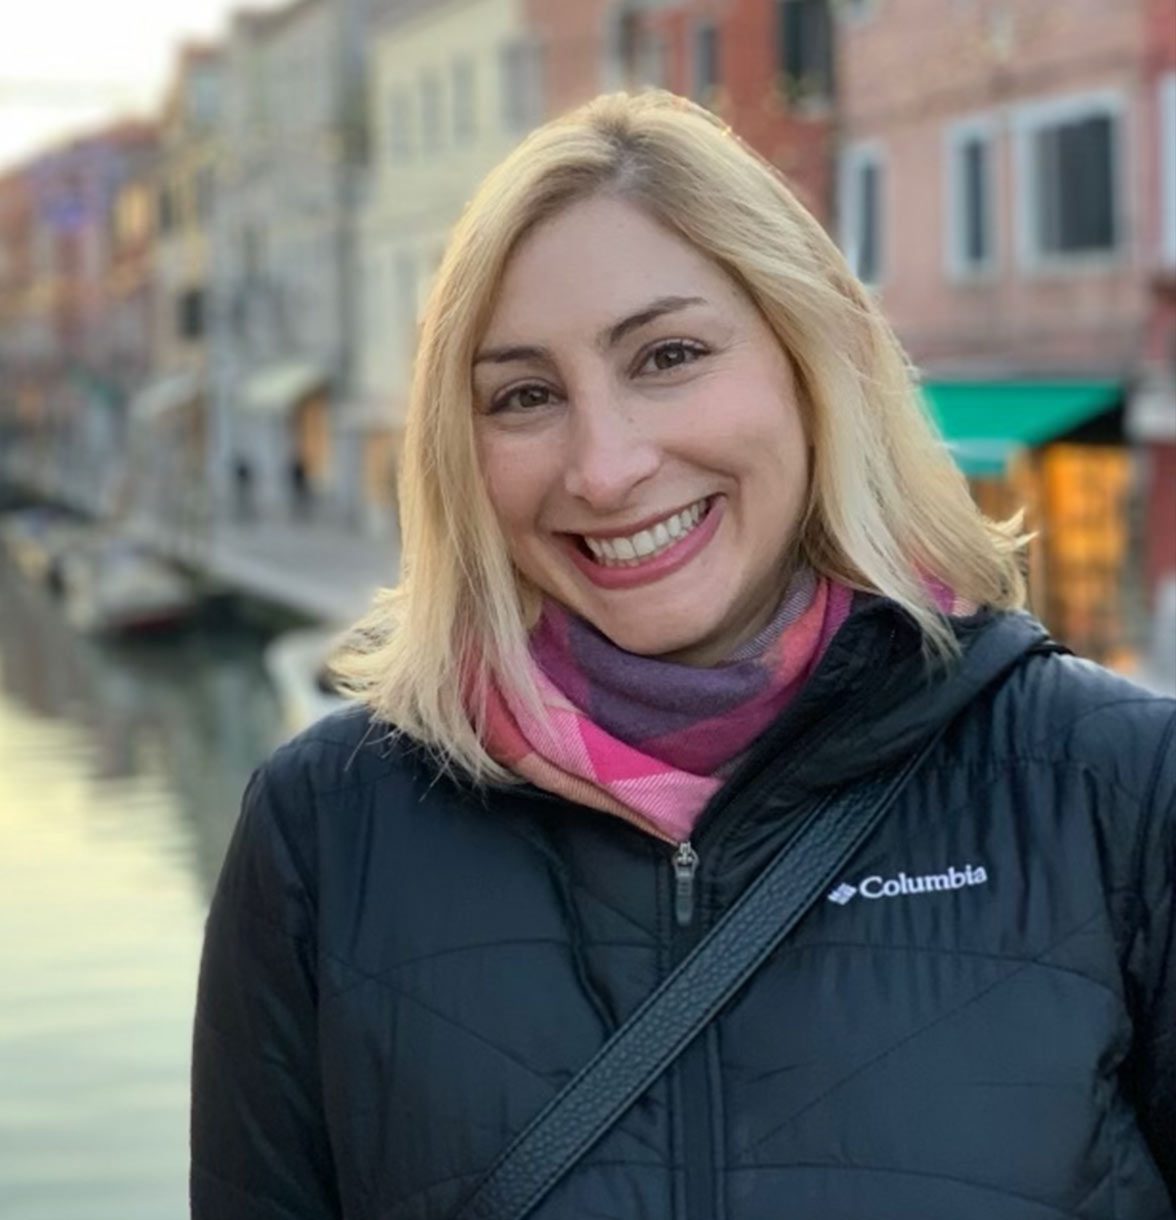 Photo of Hannah Russin, Signos' chief marketing officer